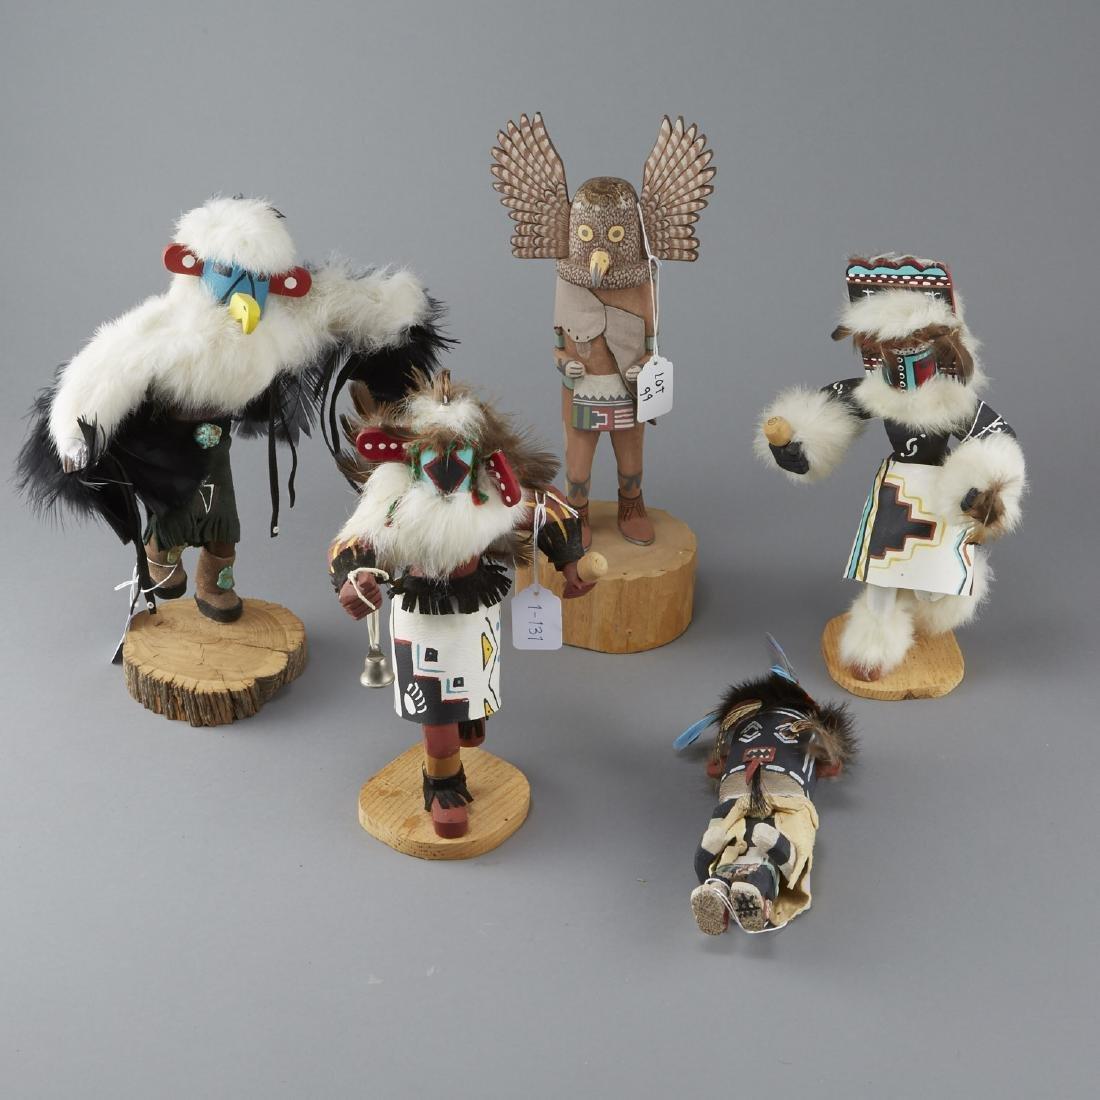 5 Kachina Figures Eagle, Chasing Star, Sio Hemis